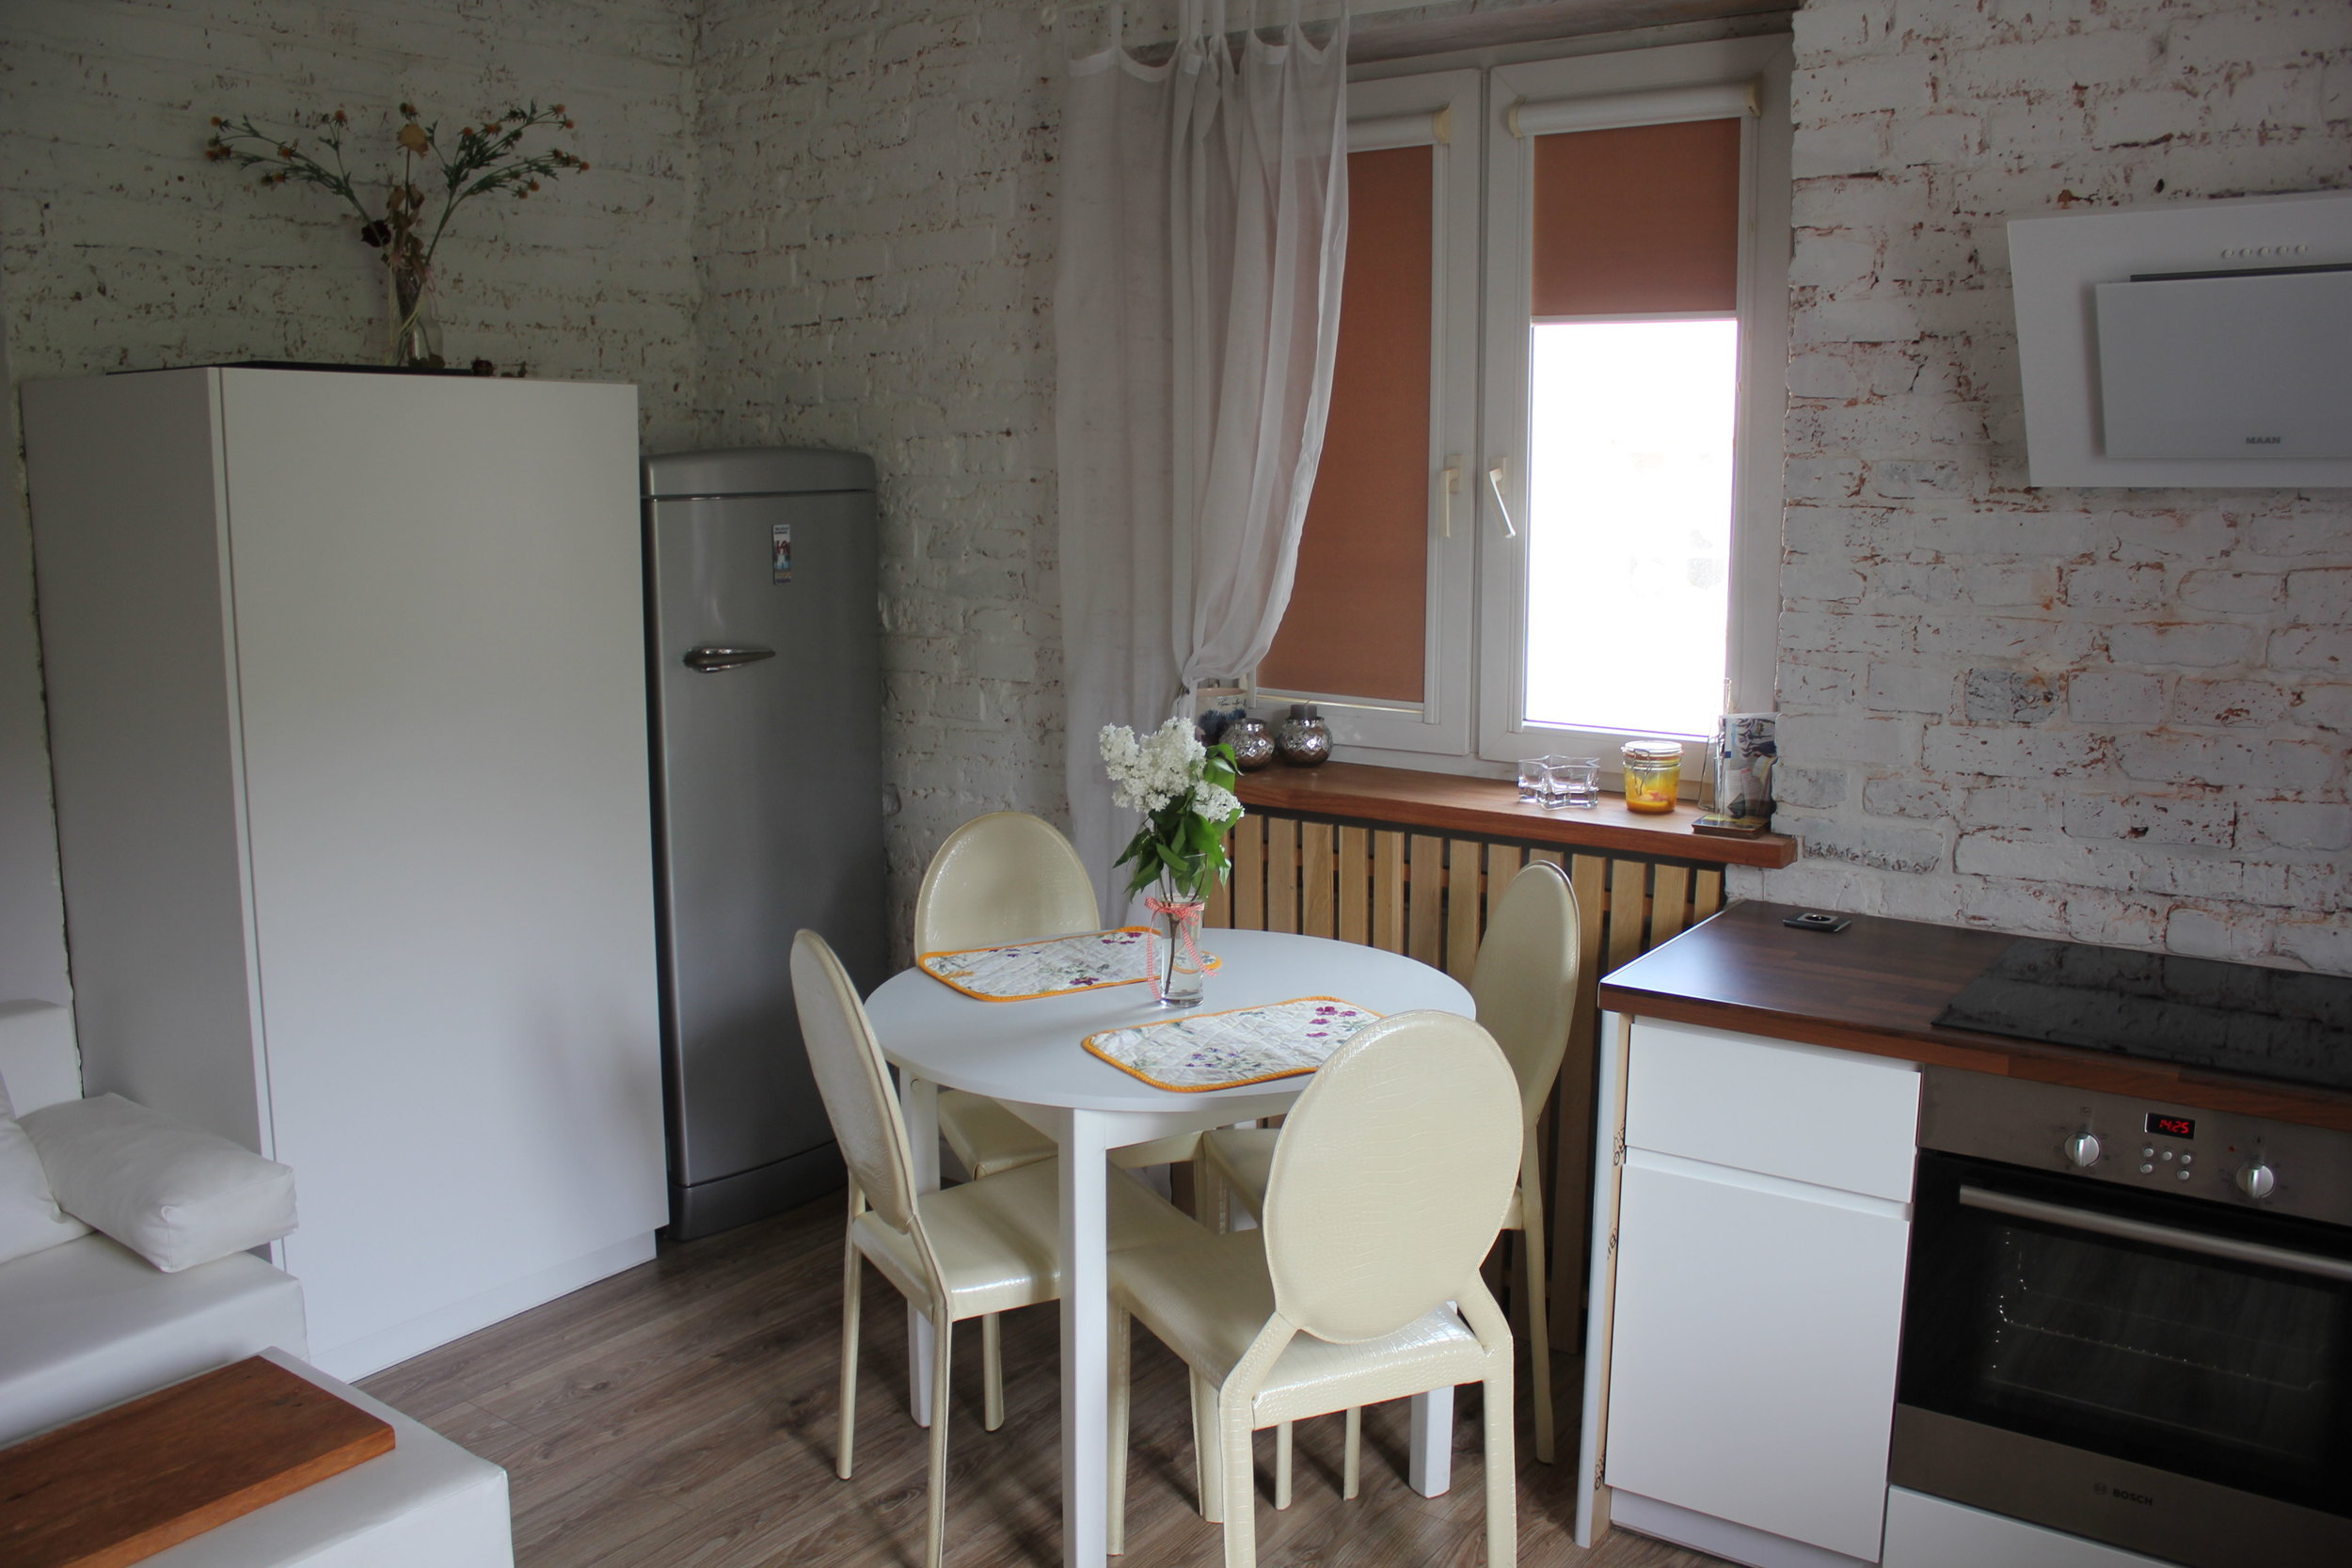 Apartament na Mariensztacie – Dining table